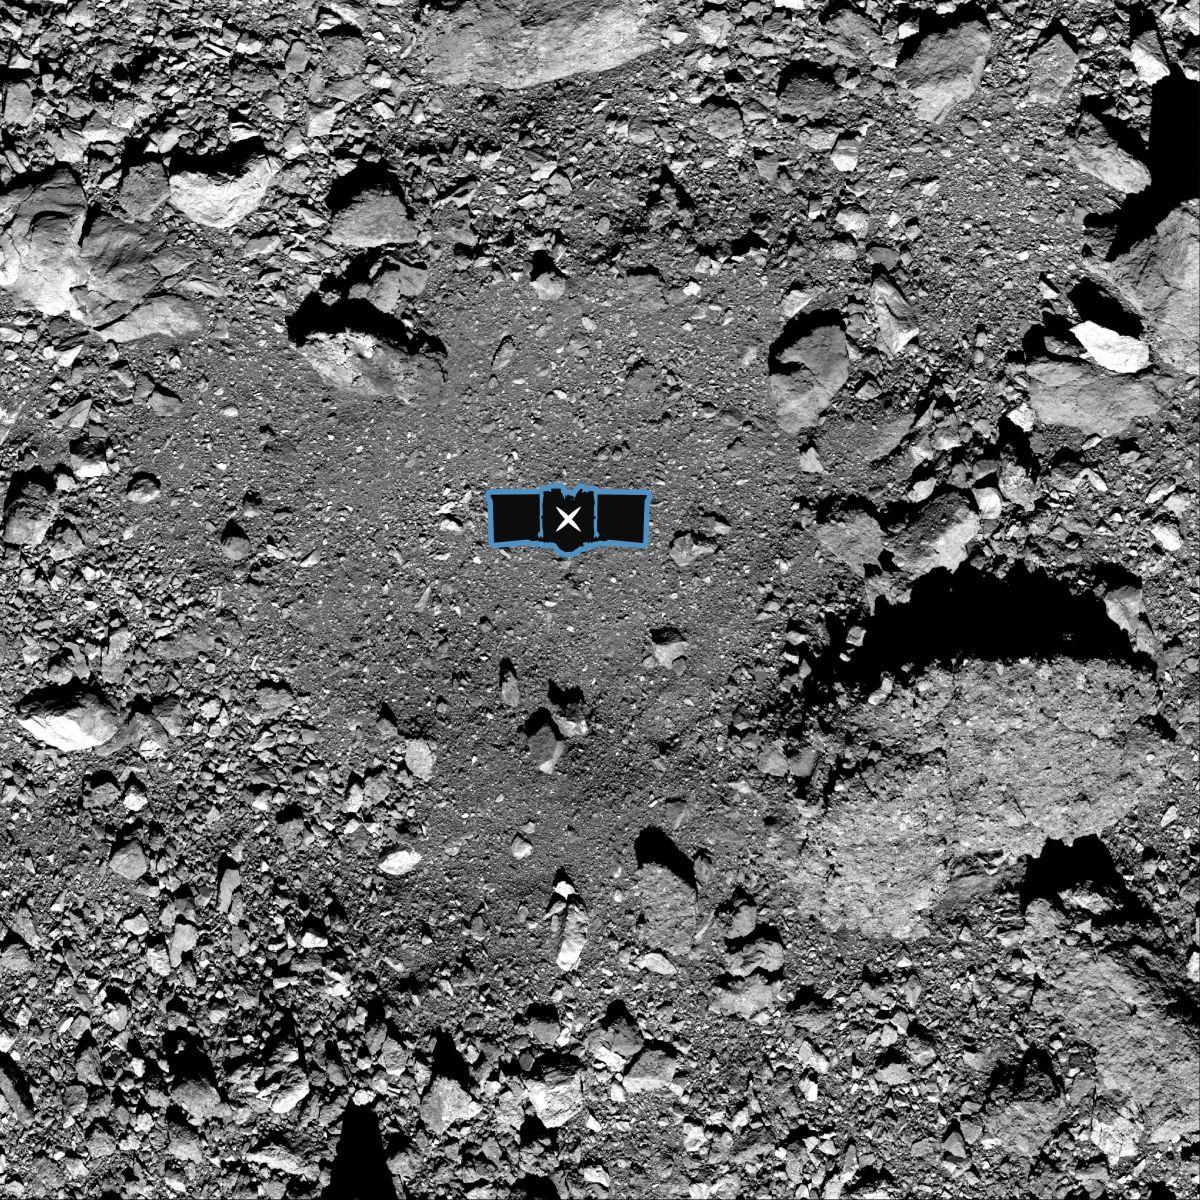 It's No Lark: NASA Asteroid Mission Picks 'Nightingale' As Sampling Site